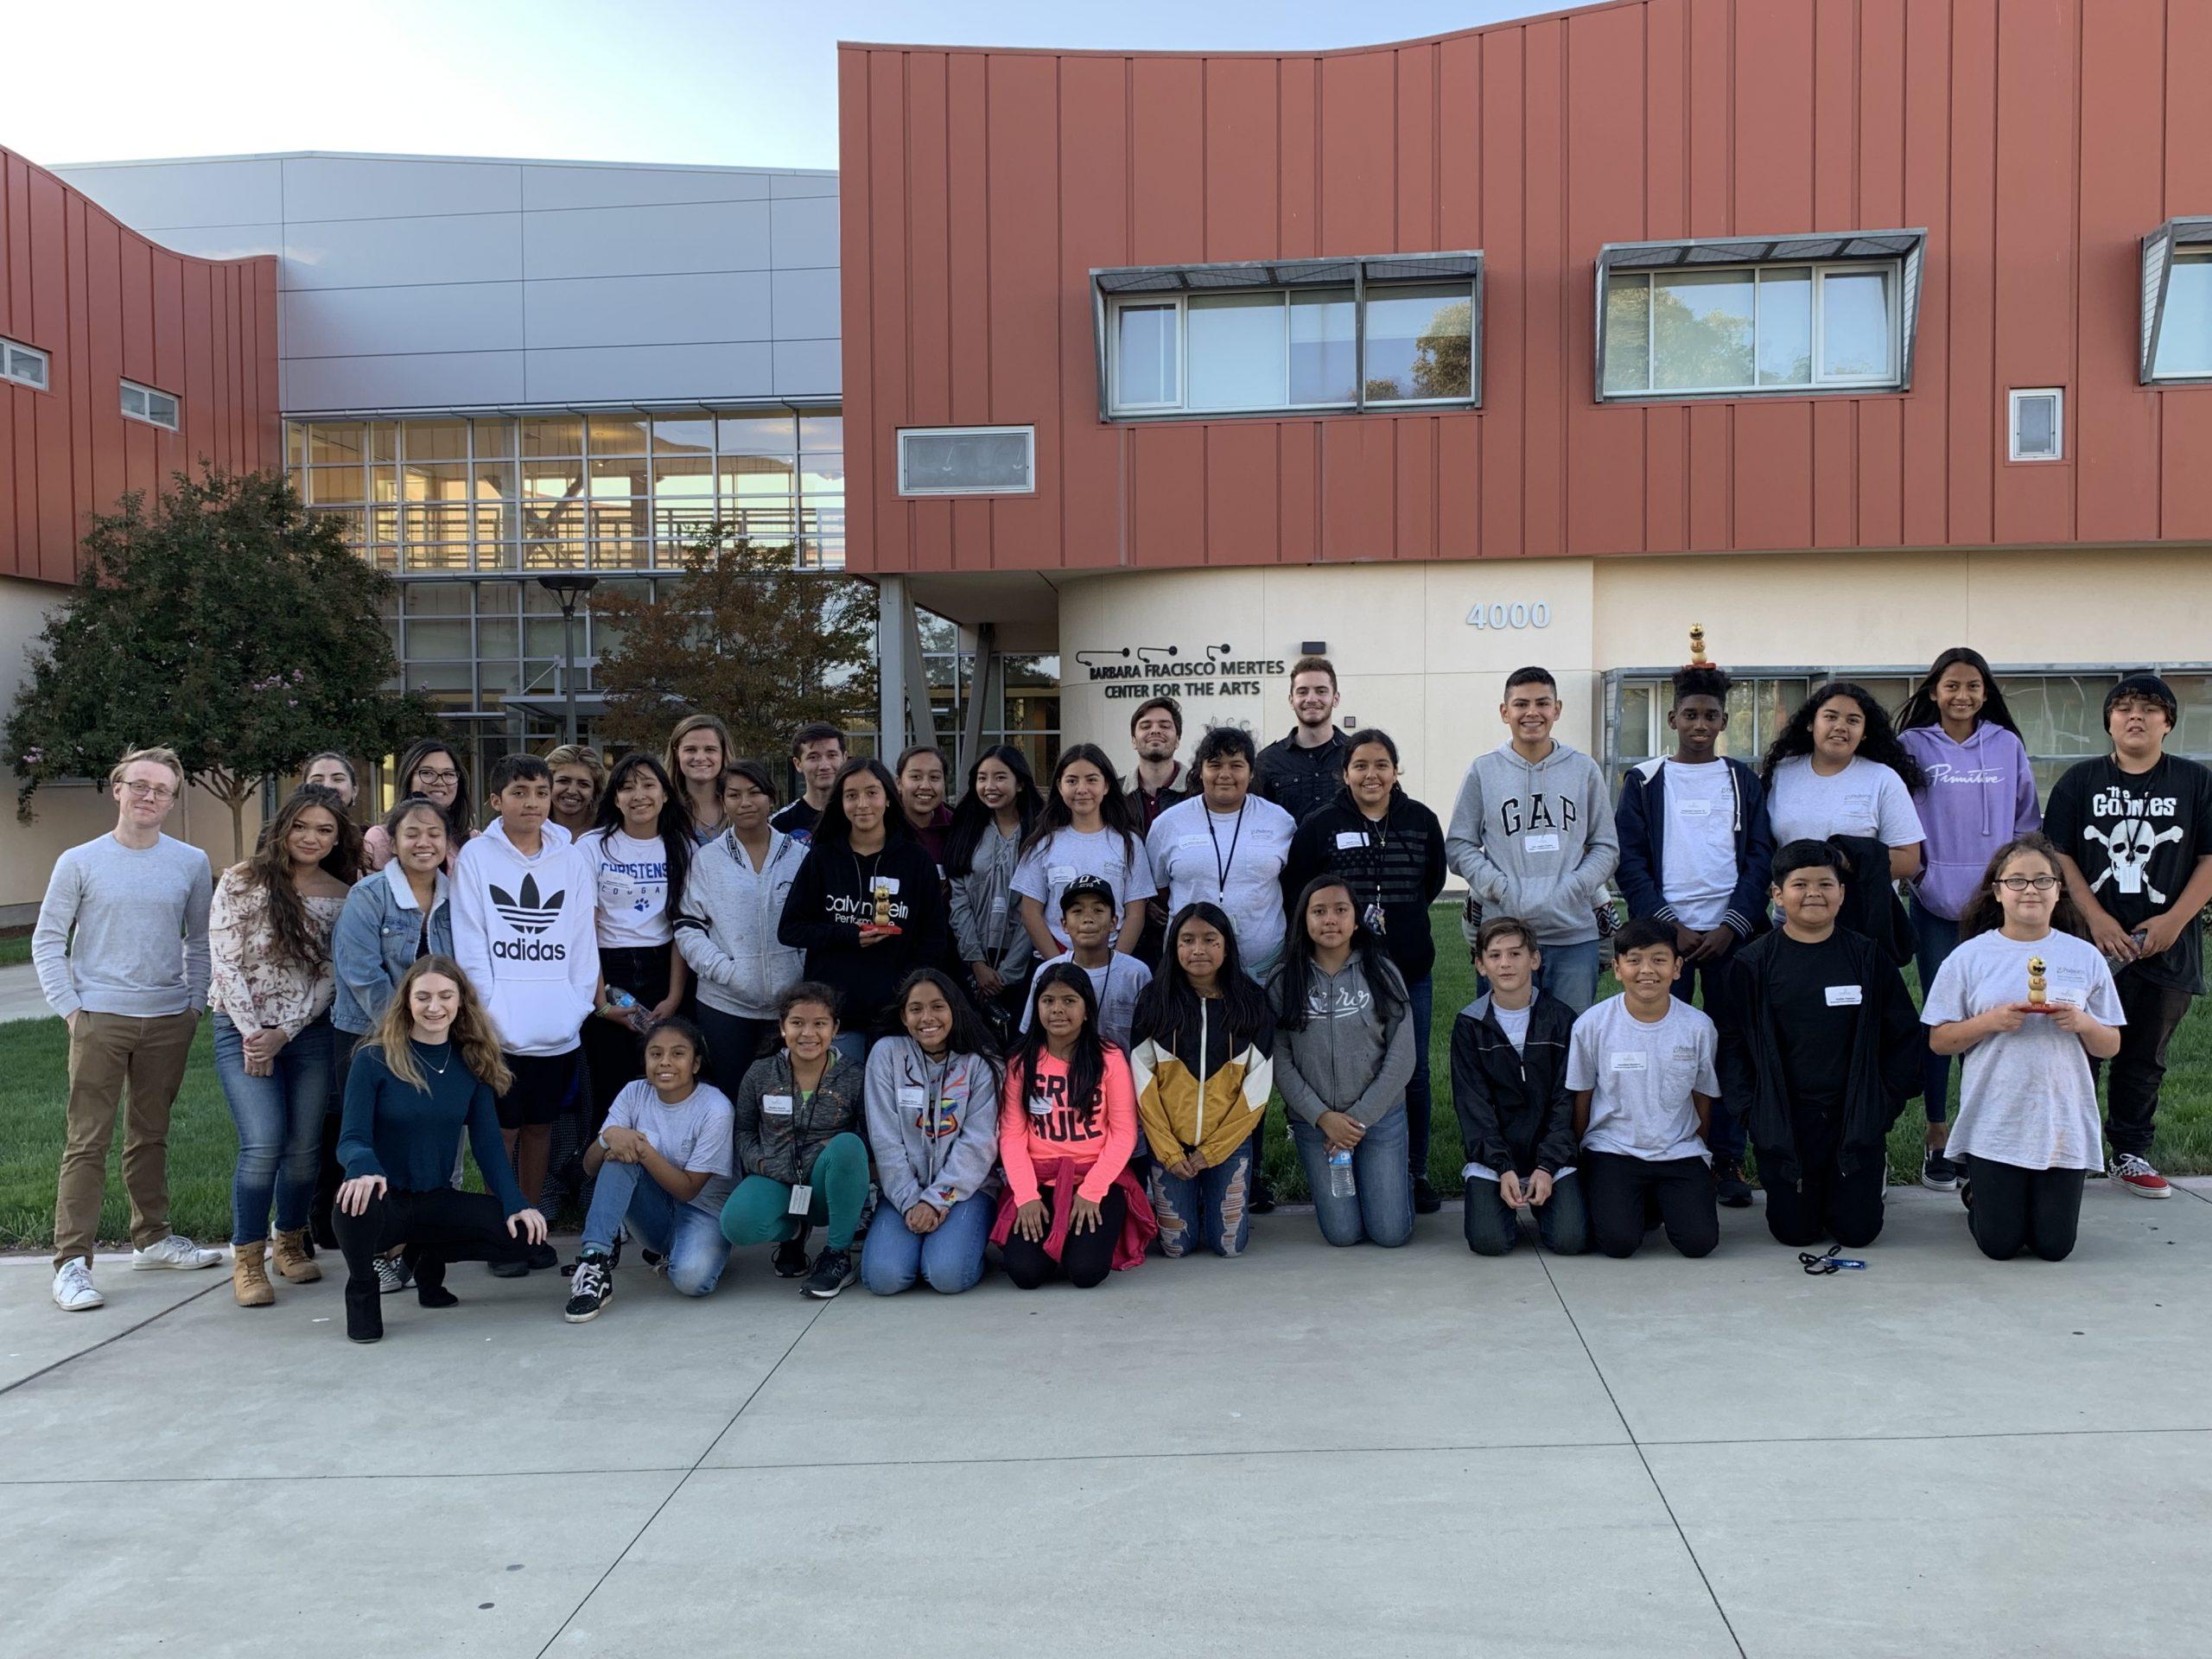 Pedrozzi Young Scholars – Las Positas College Talk Hawks Visit